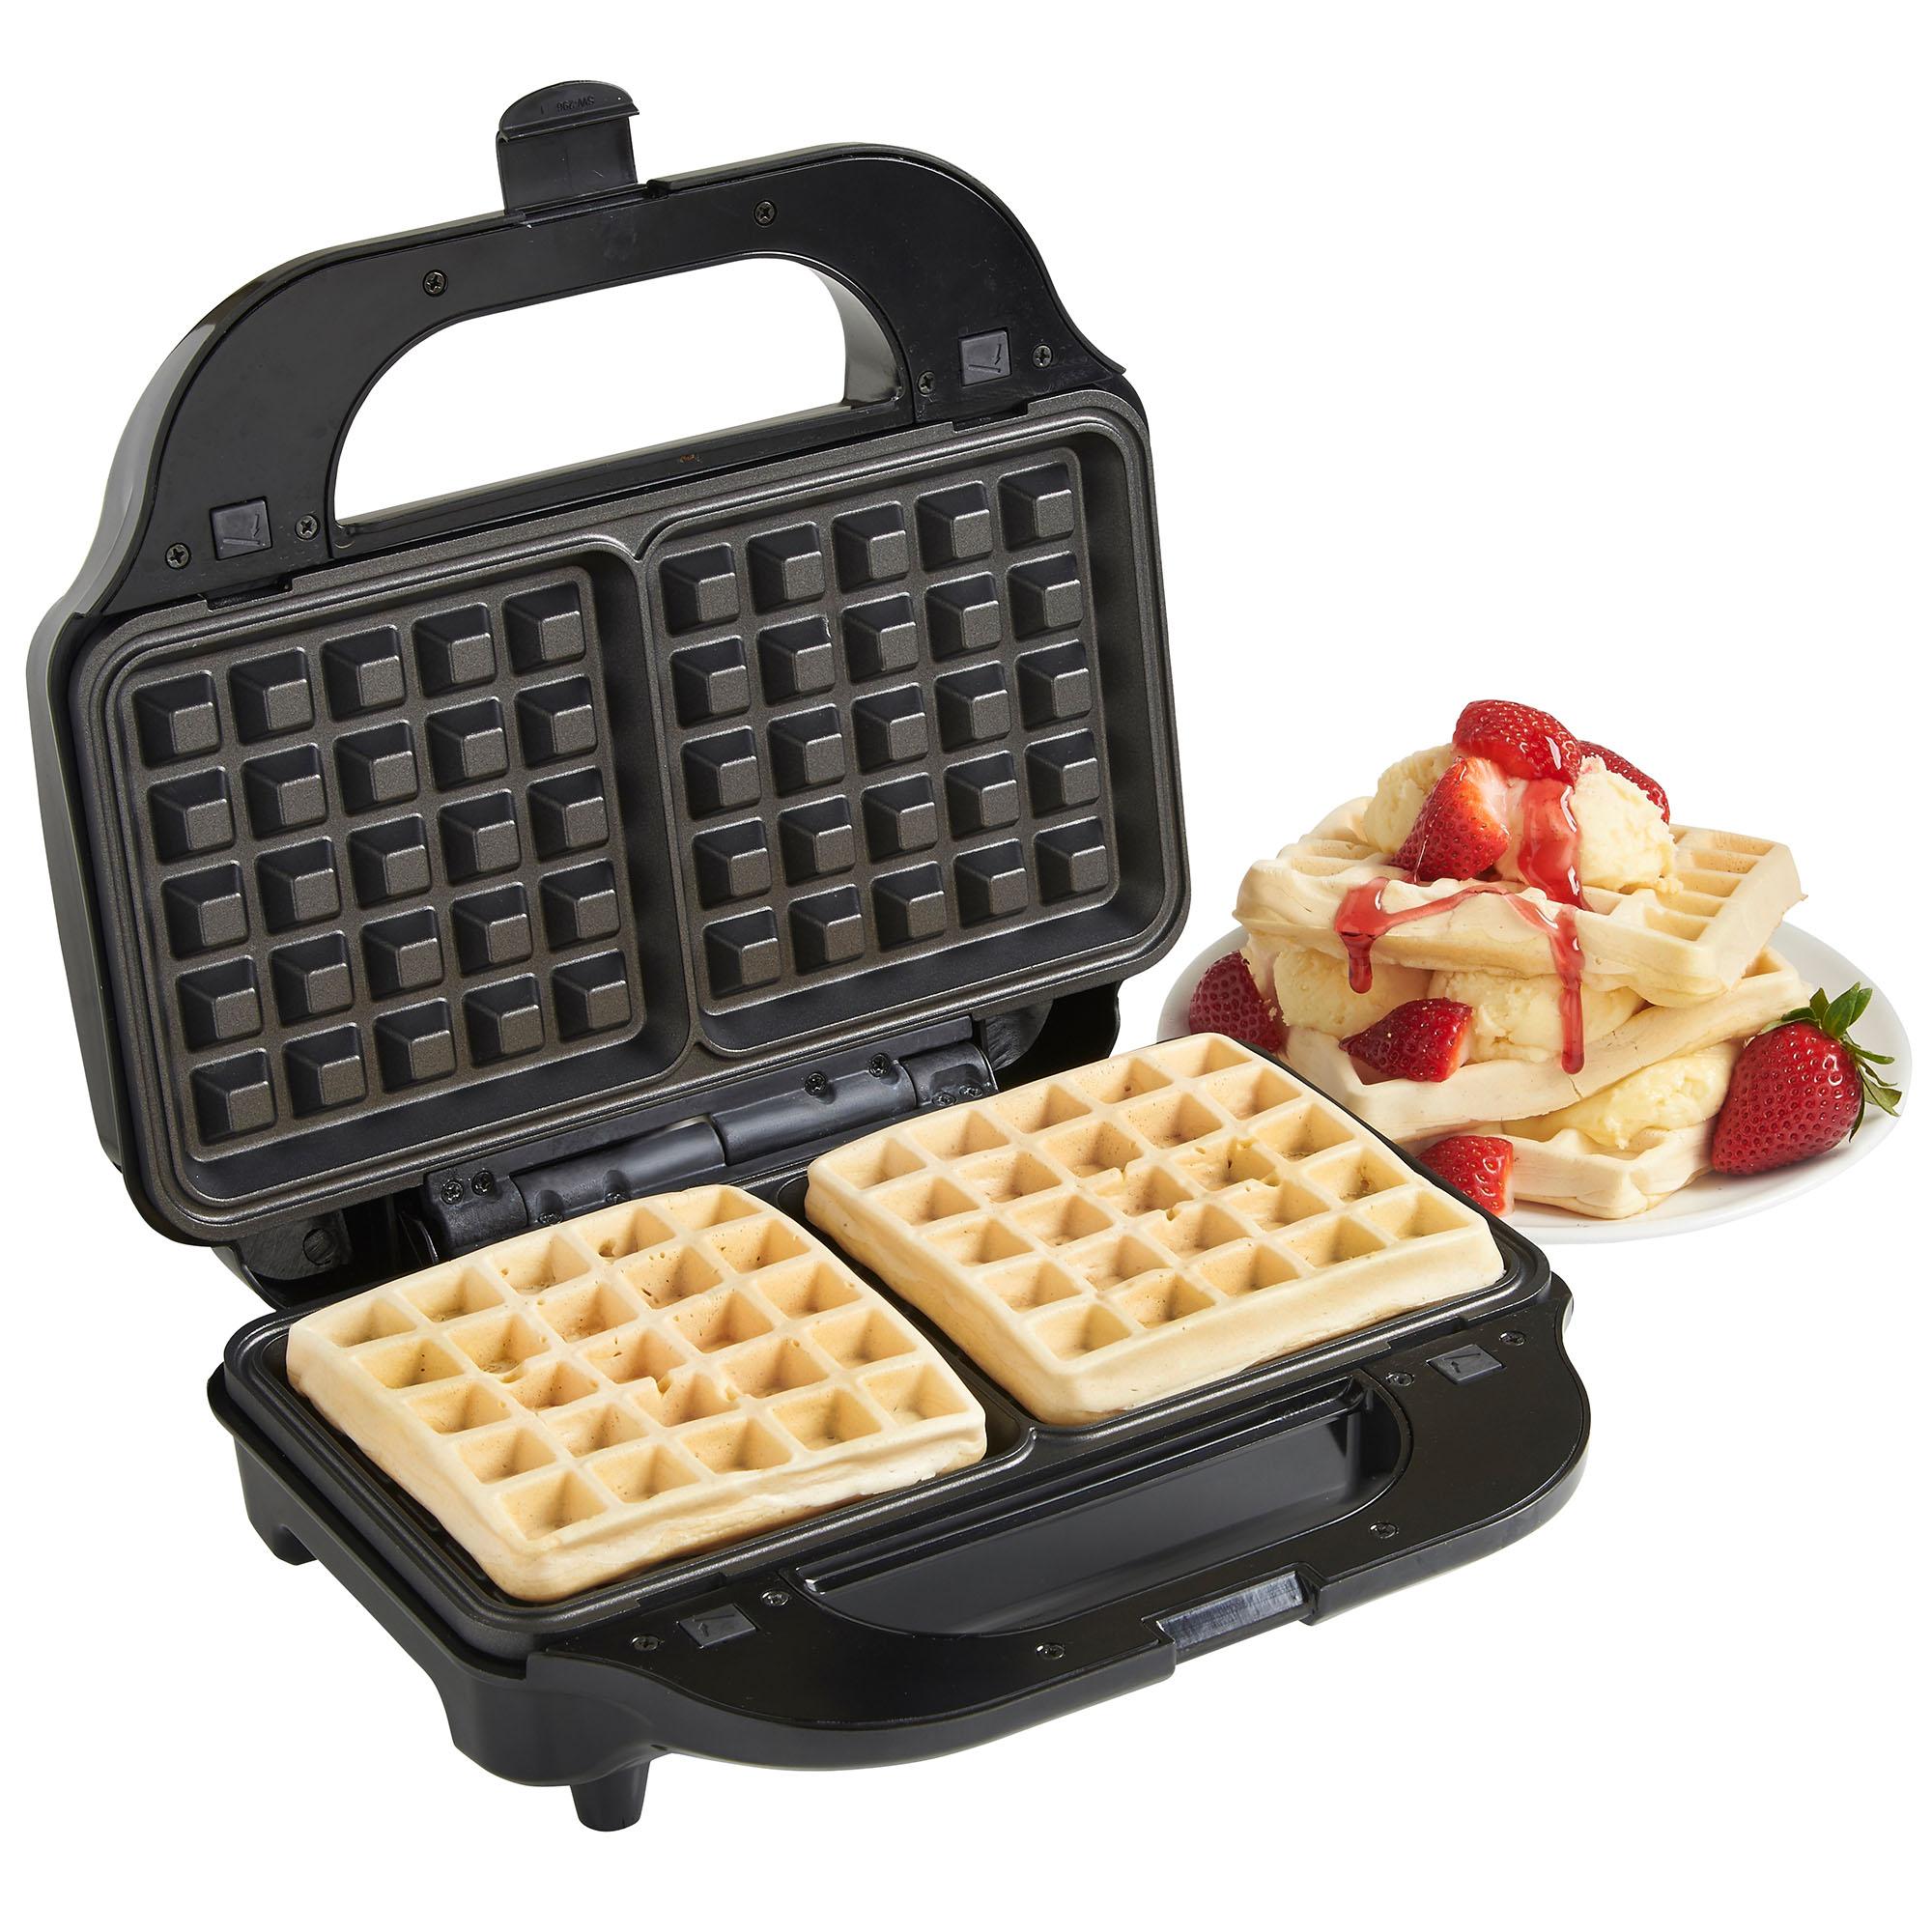 vonshef 2 in 1 sandwich maker toaster waffle iron 800w. Black Bedroom Furniture Sets. Home Design Ideas